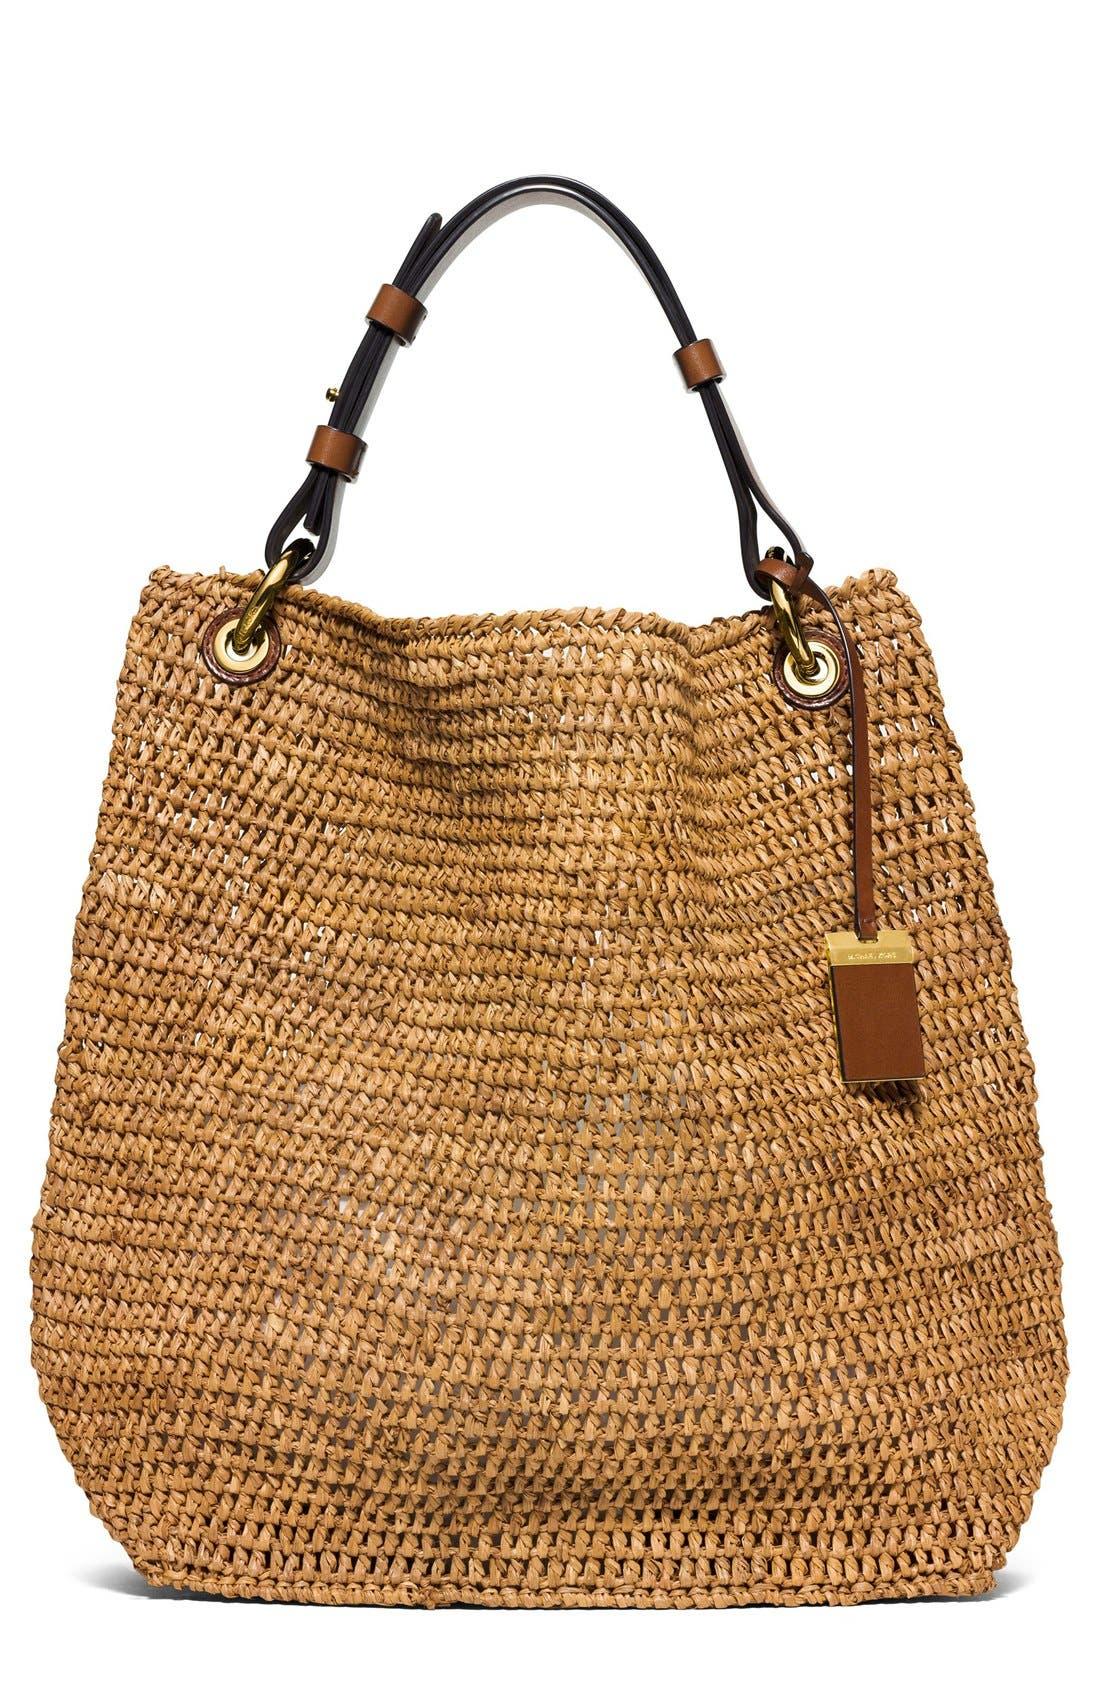 Alternate Image 1 Selected - Michael Kors 'Large Santorini' Raffia Shoulder Bag